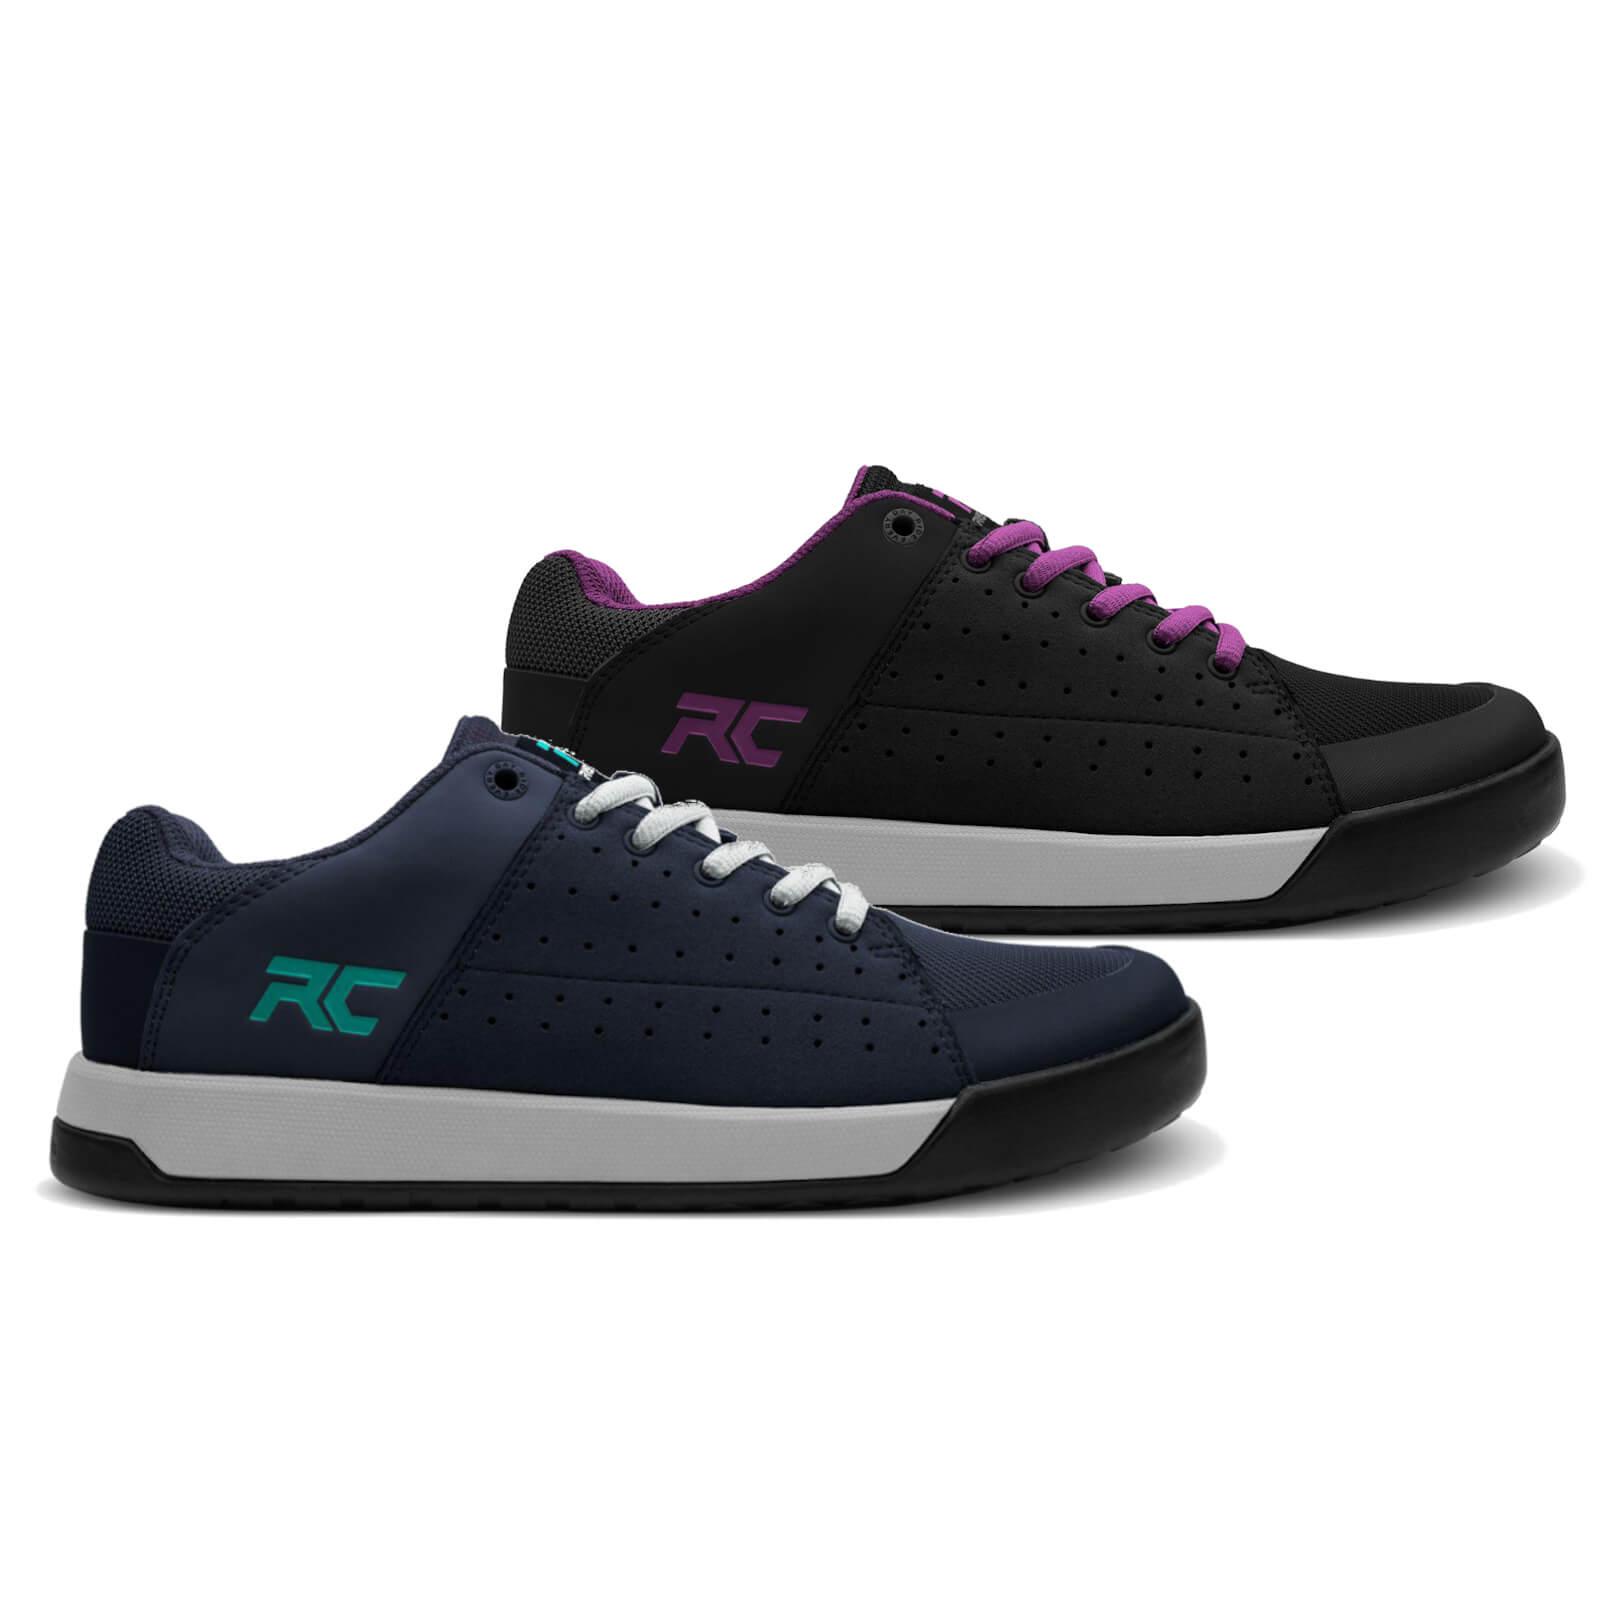 Ride Concepts Women's Livewire Flat MTB Shoes - UK 5/EU 36 - Navy/Teal